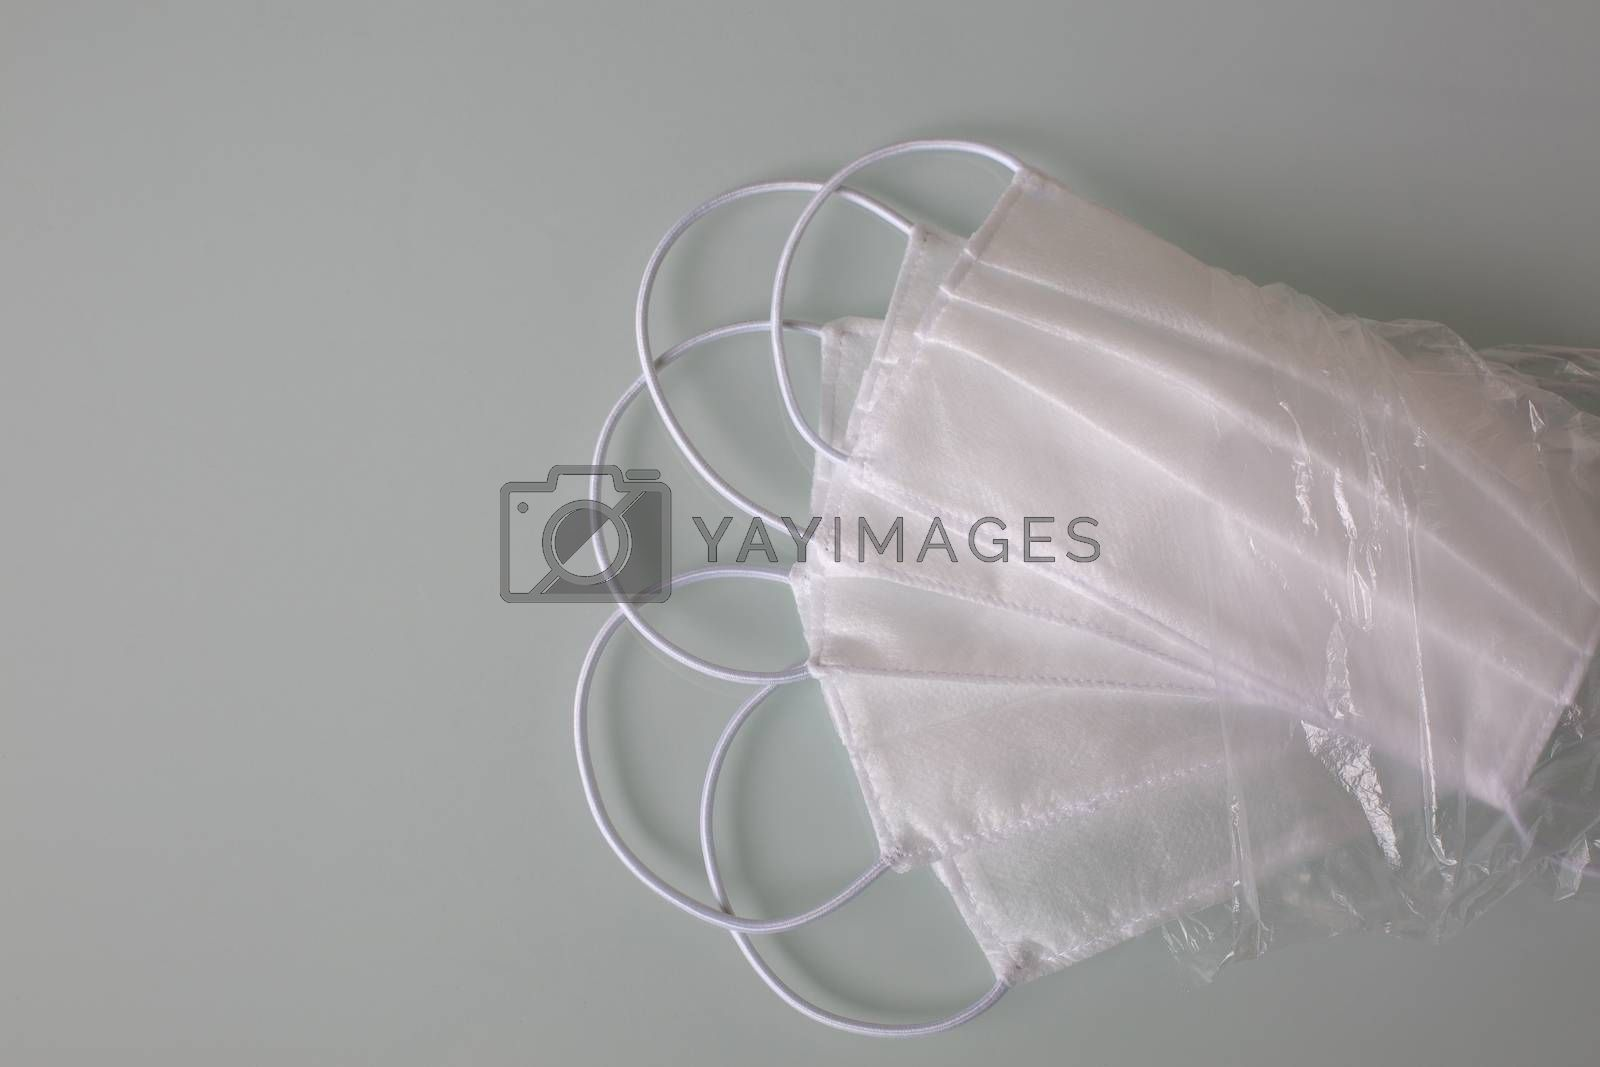 Kit of protective medical masks against corona virus. Empty space